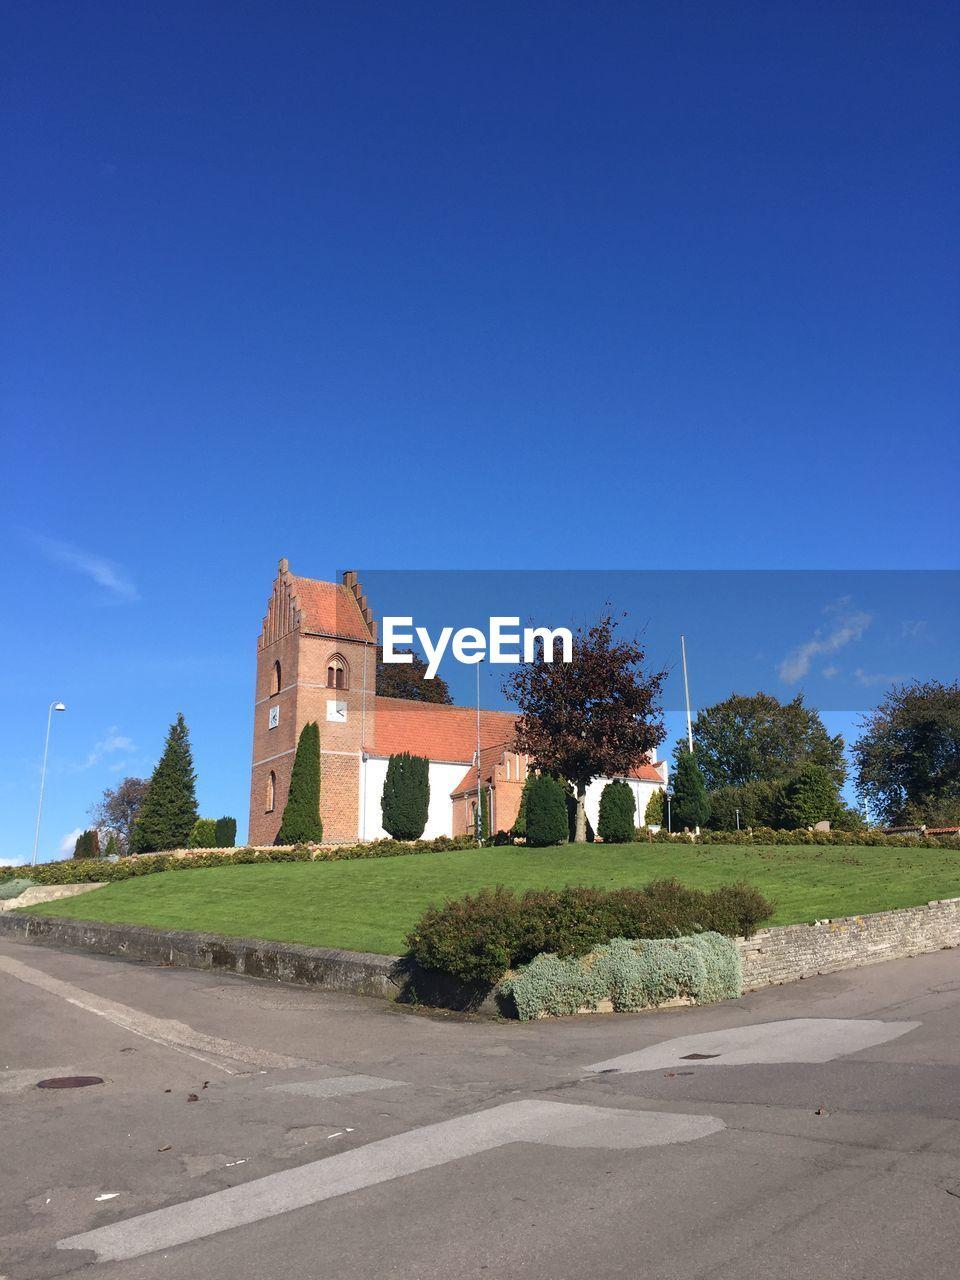 VIEW OF CASTLE AGAINST BLUE SKY